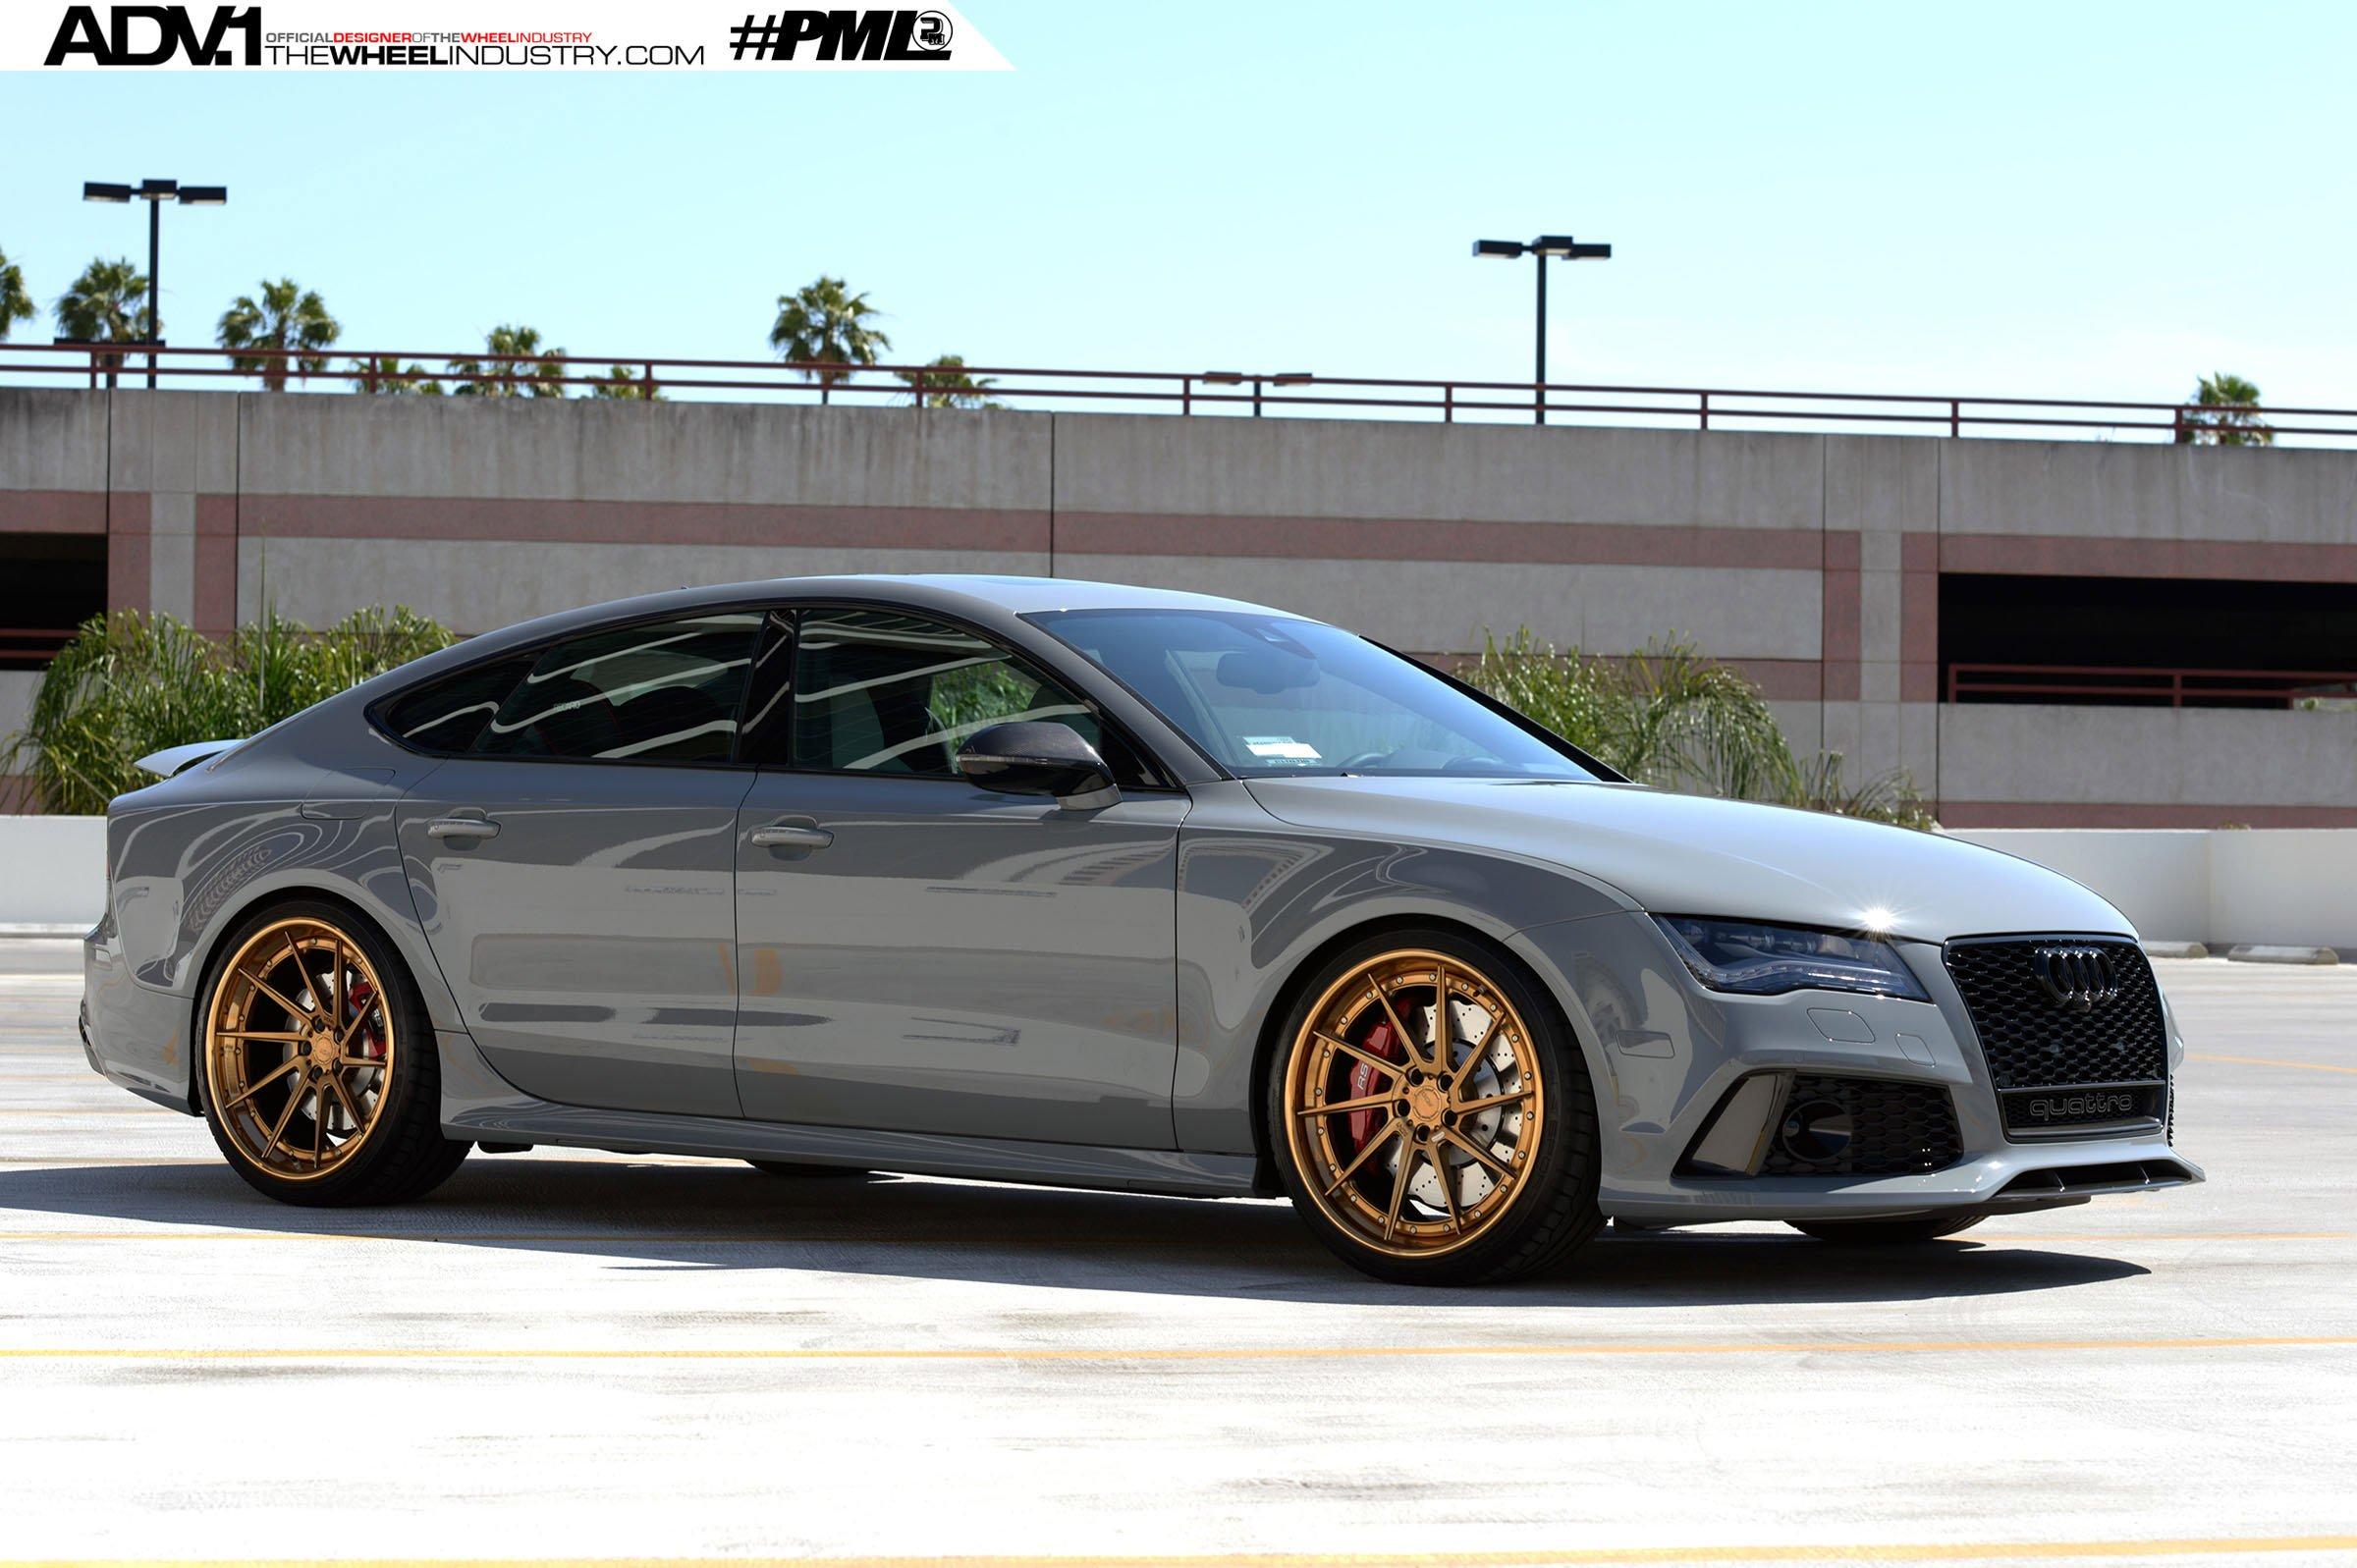 Adv 1 Wheels Gallery Audi Rs7 Cars Tuning Wallpaper